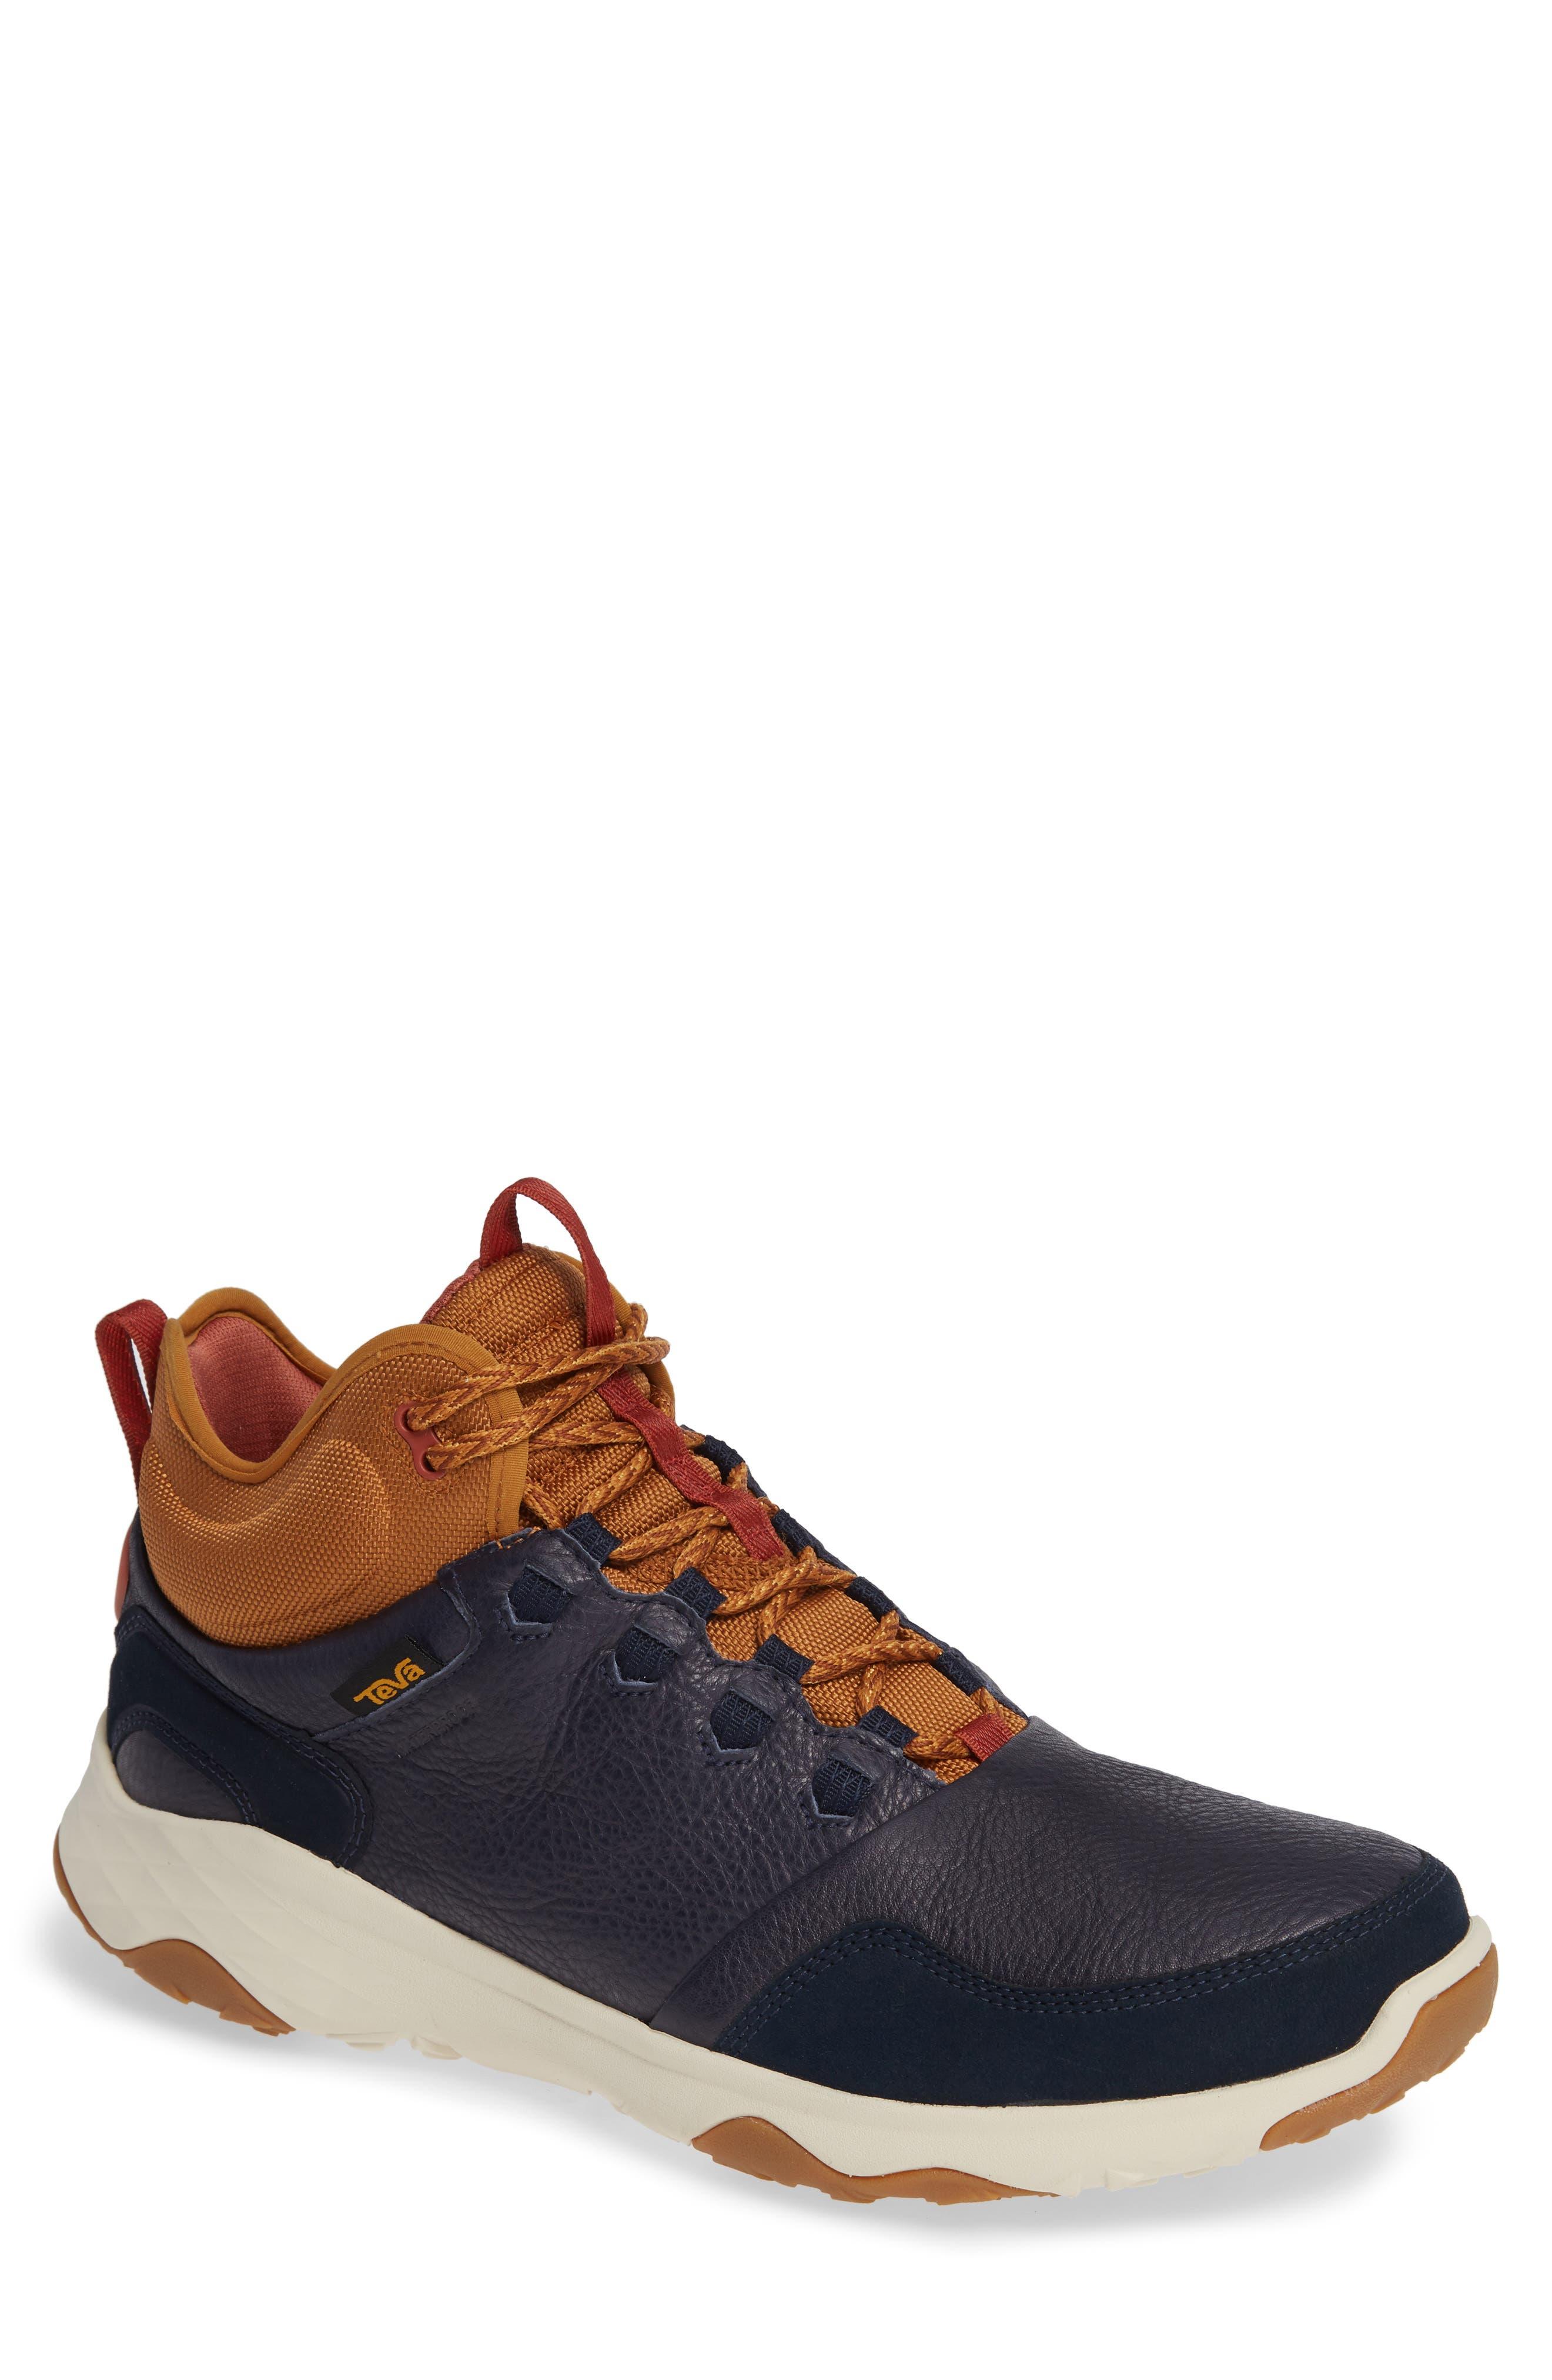 Arrowood 2 Mid Waterproof Sneaker Boot,                         Main,                         color, MIDNIGHT NAVY LEATHER